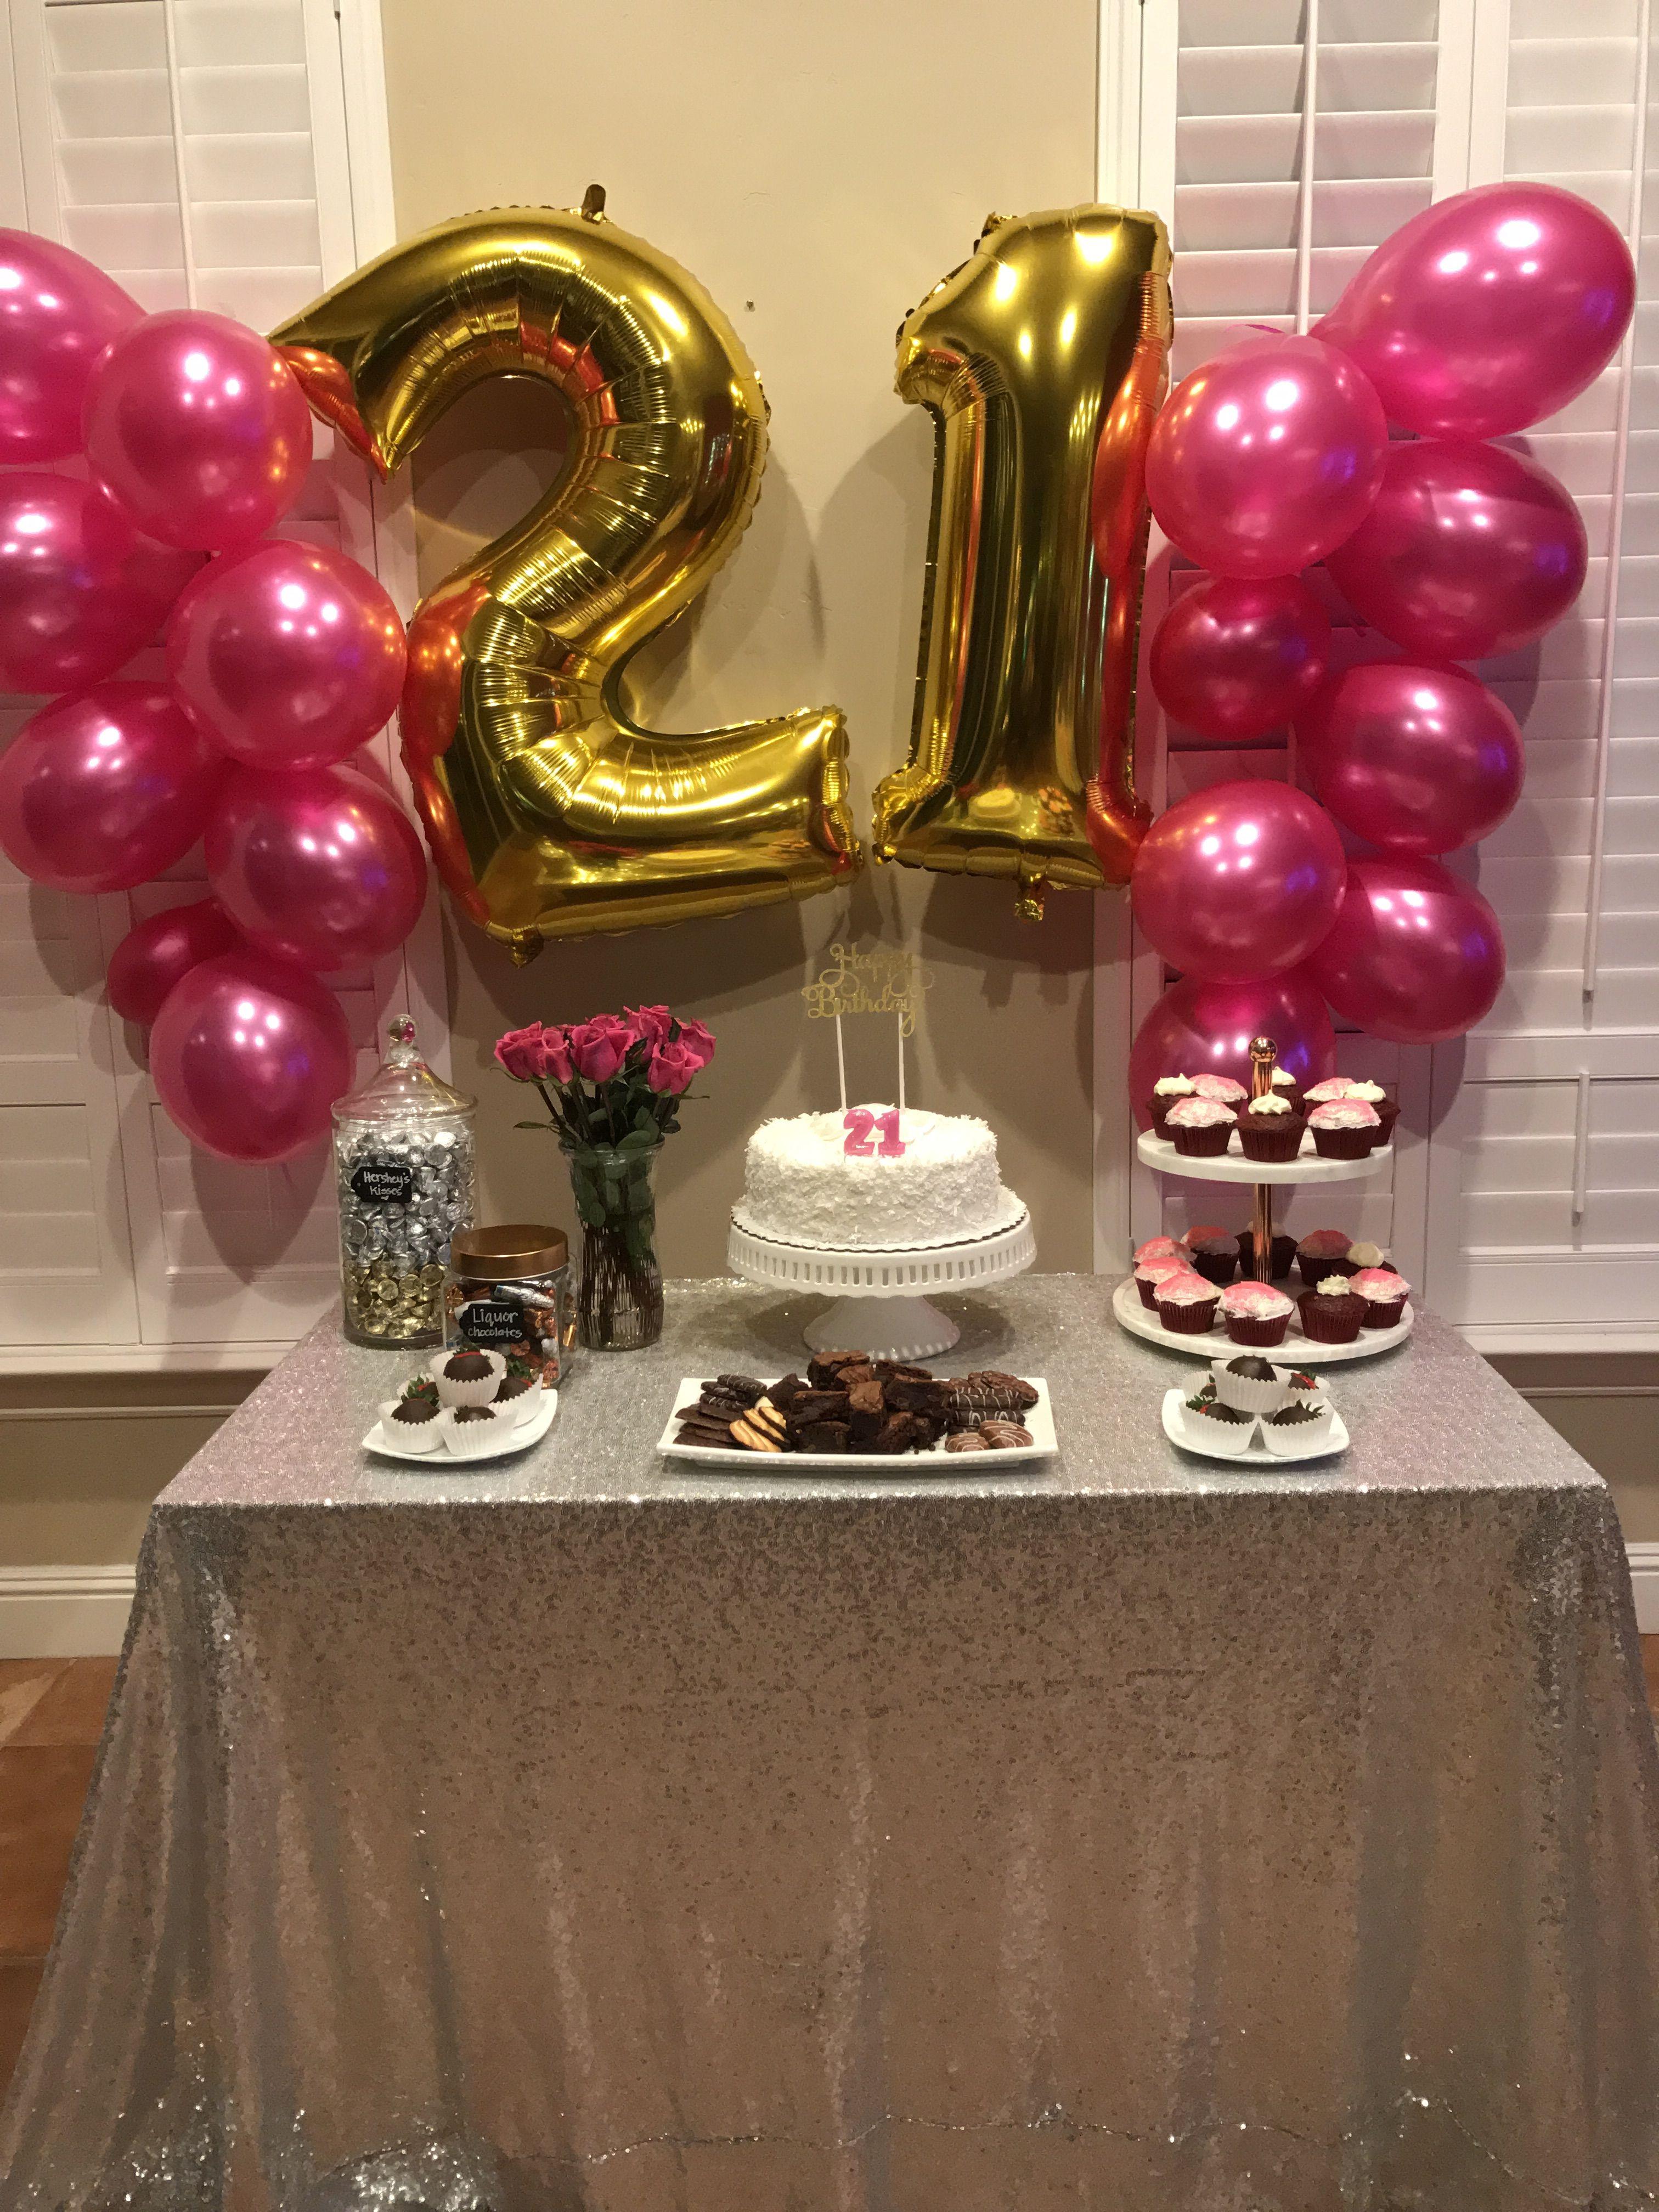 #21stbirthdaydecorations